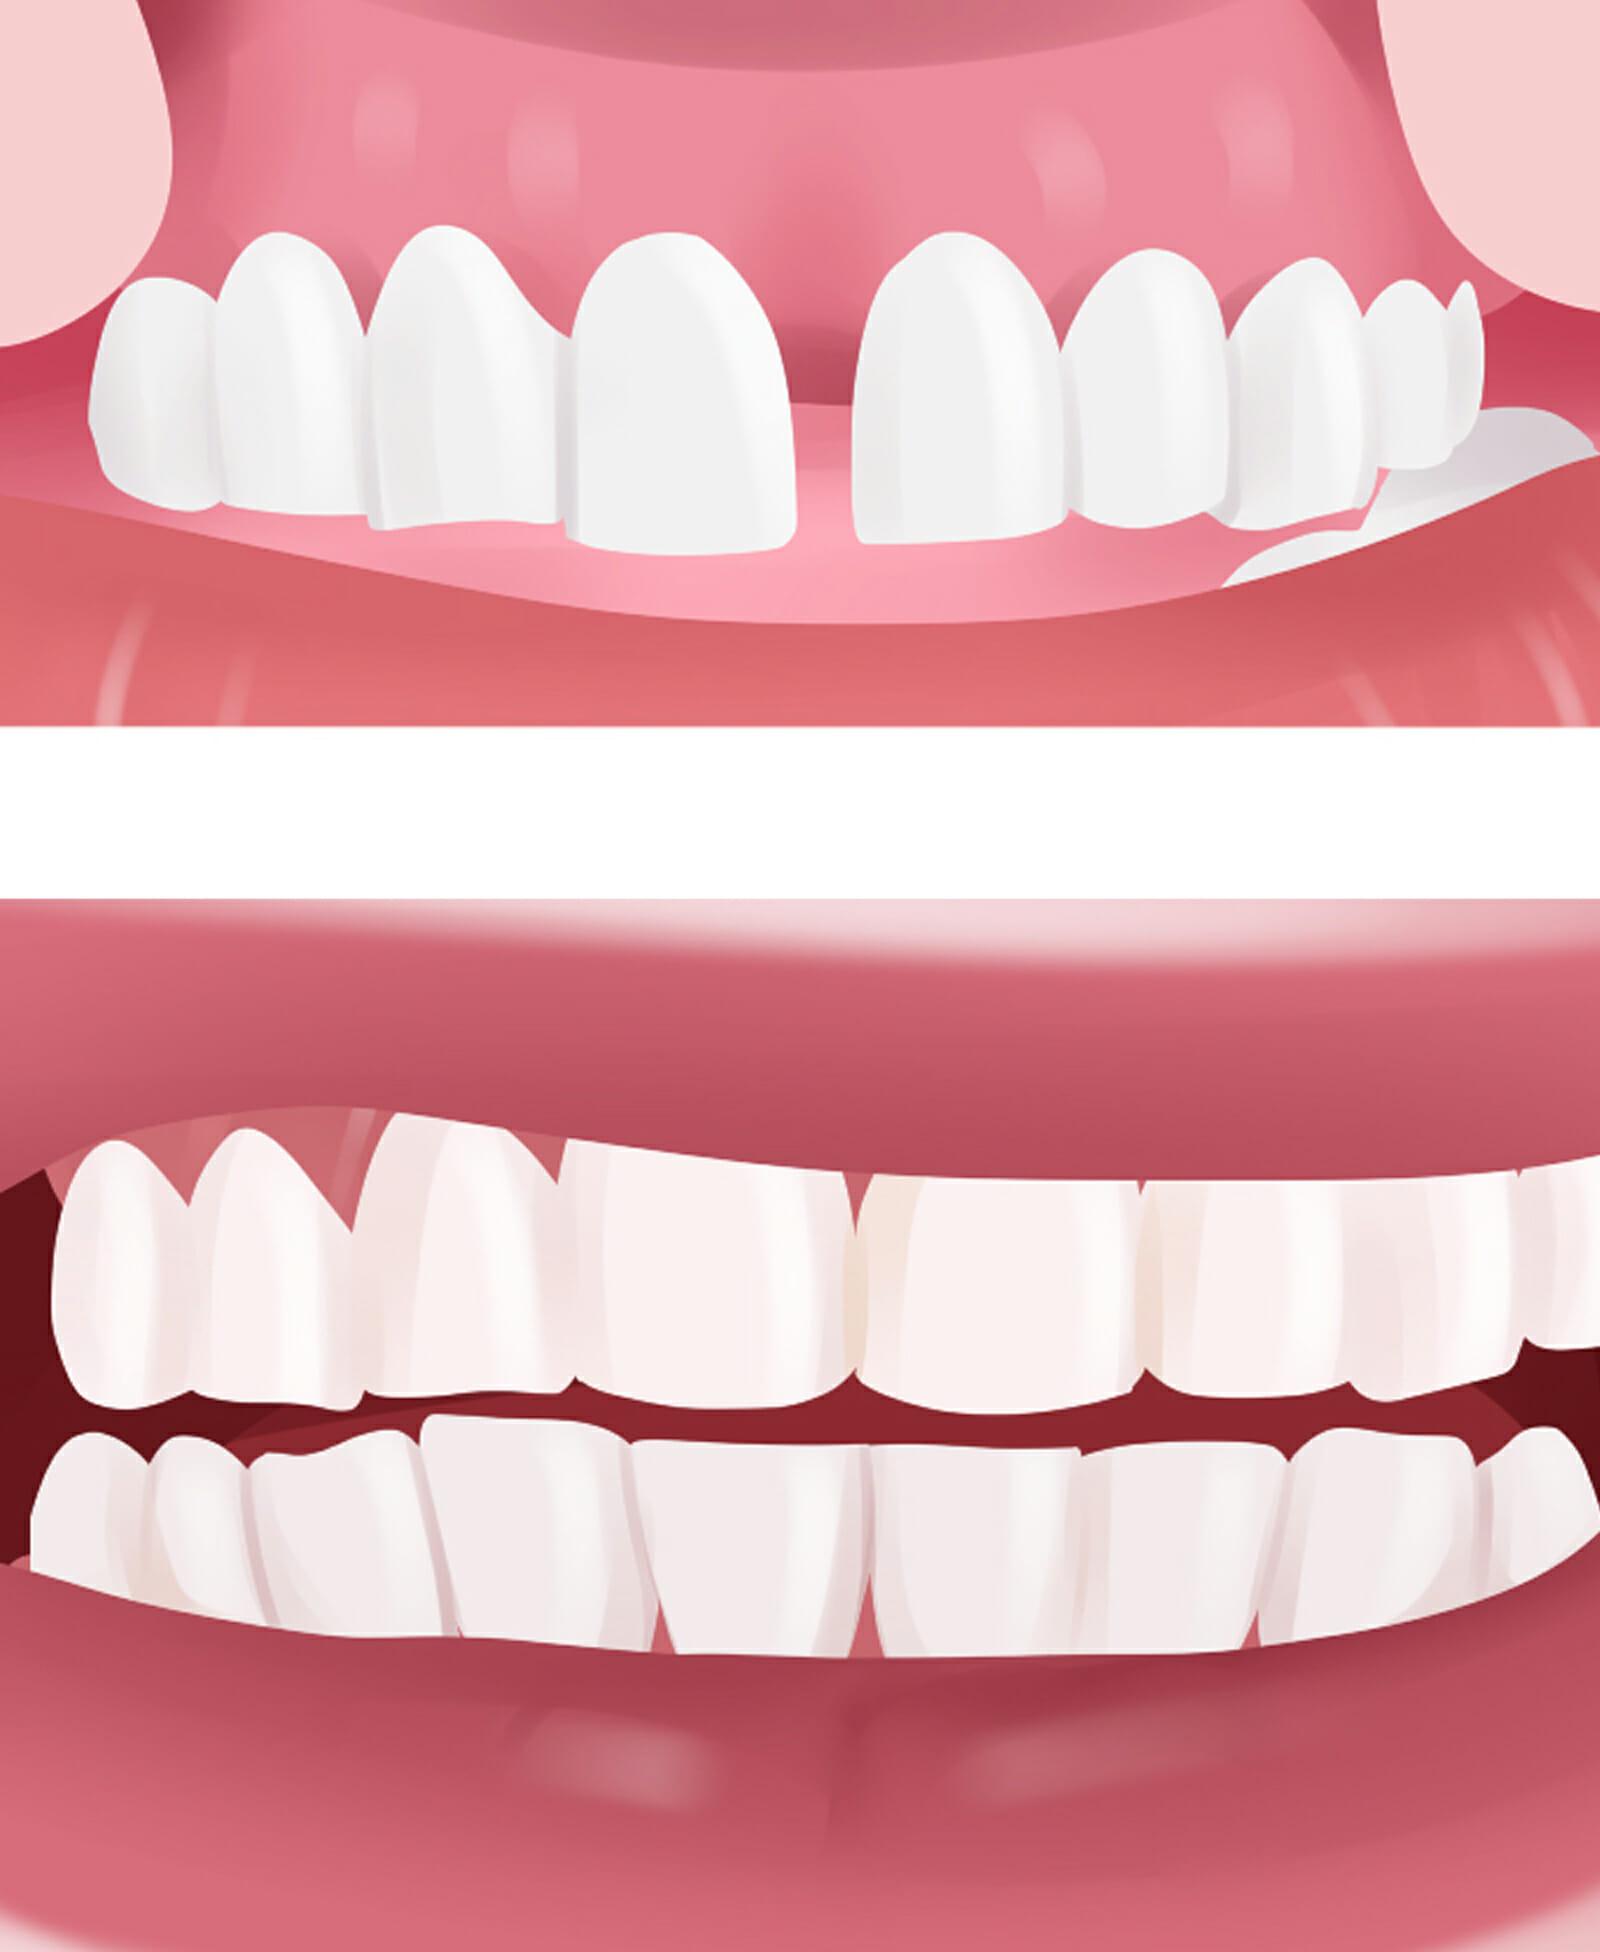 Dental Bonding procedure in Peoria